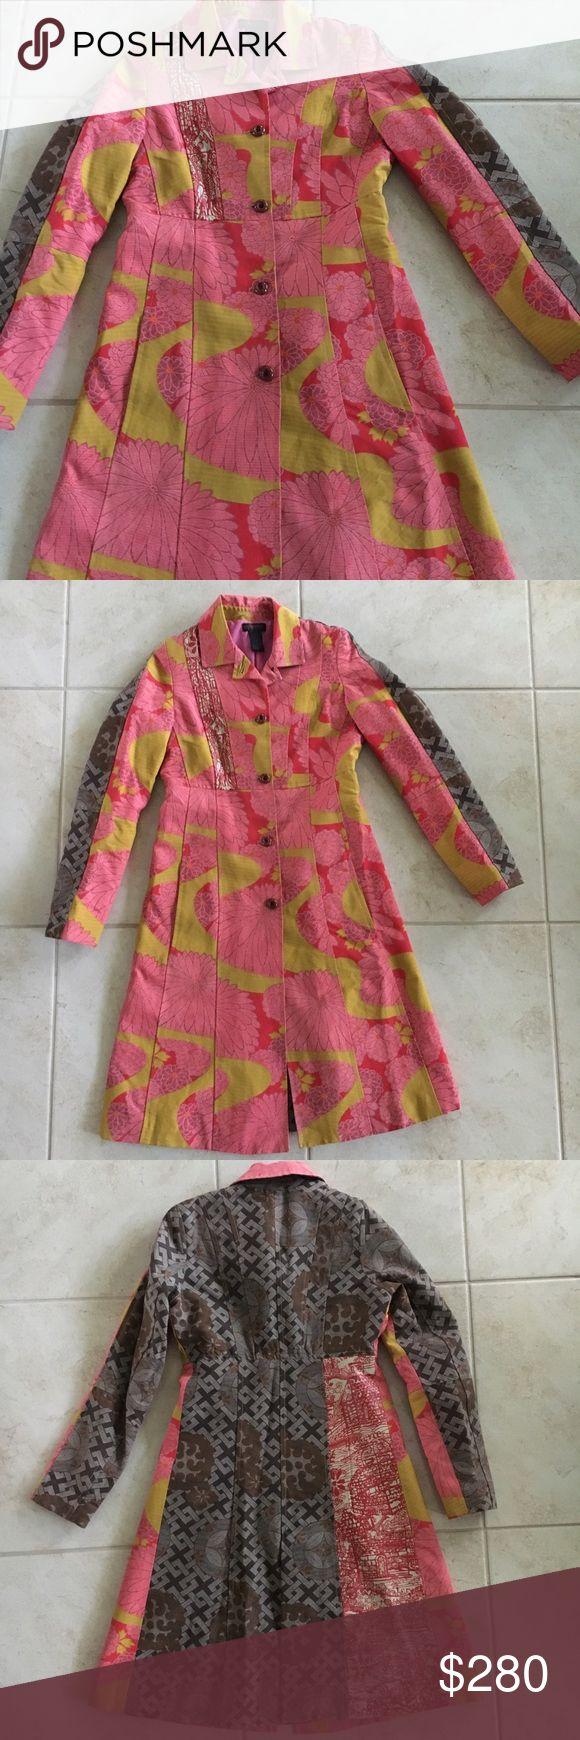 EUC Custo patchwork jacket Tailored, flattering jacket - vintage Custo Custo Barcelona Jackets & Coats